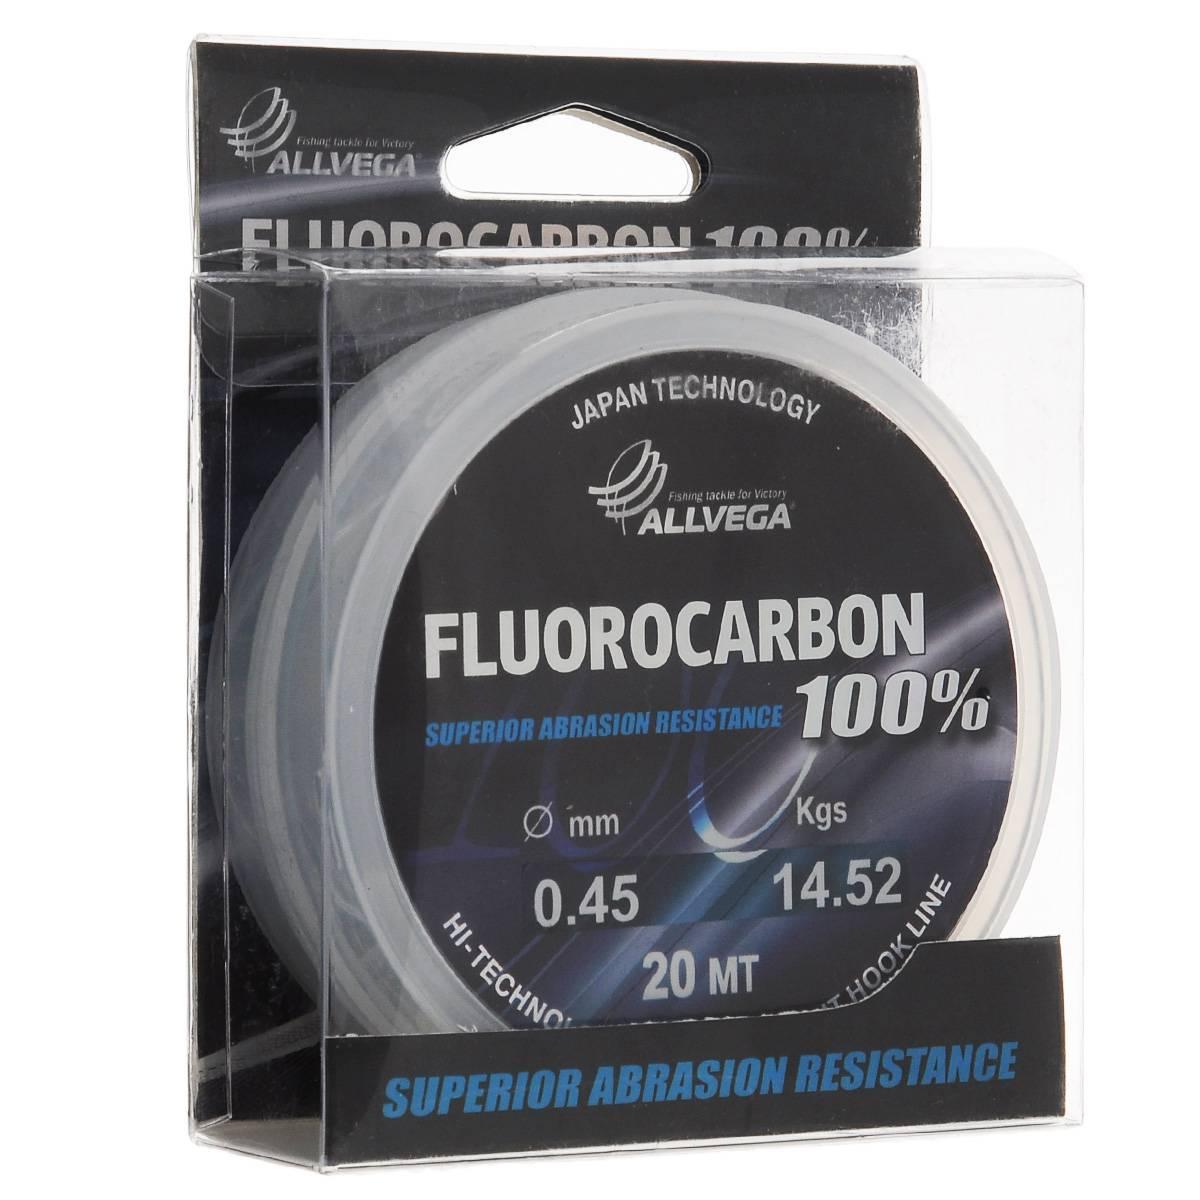 Флюорокарбоновые поводки для рыбалки своими руками